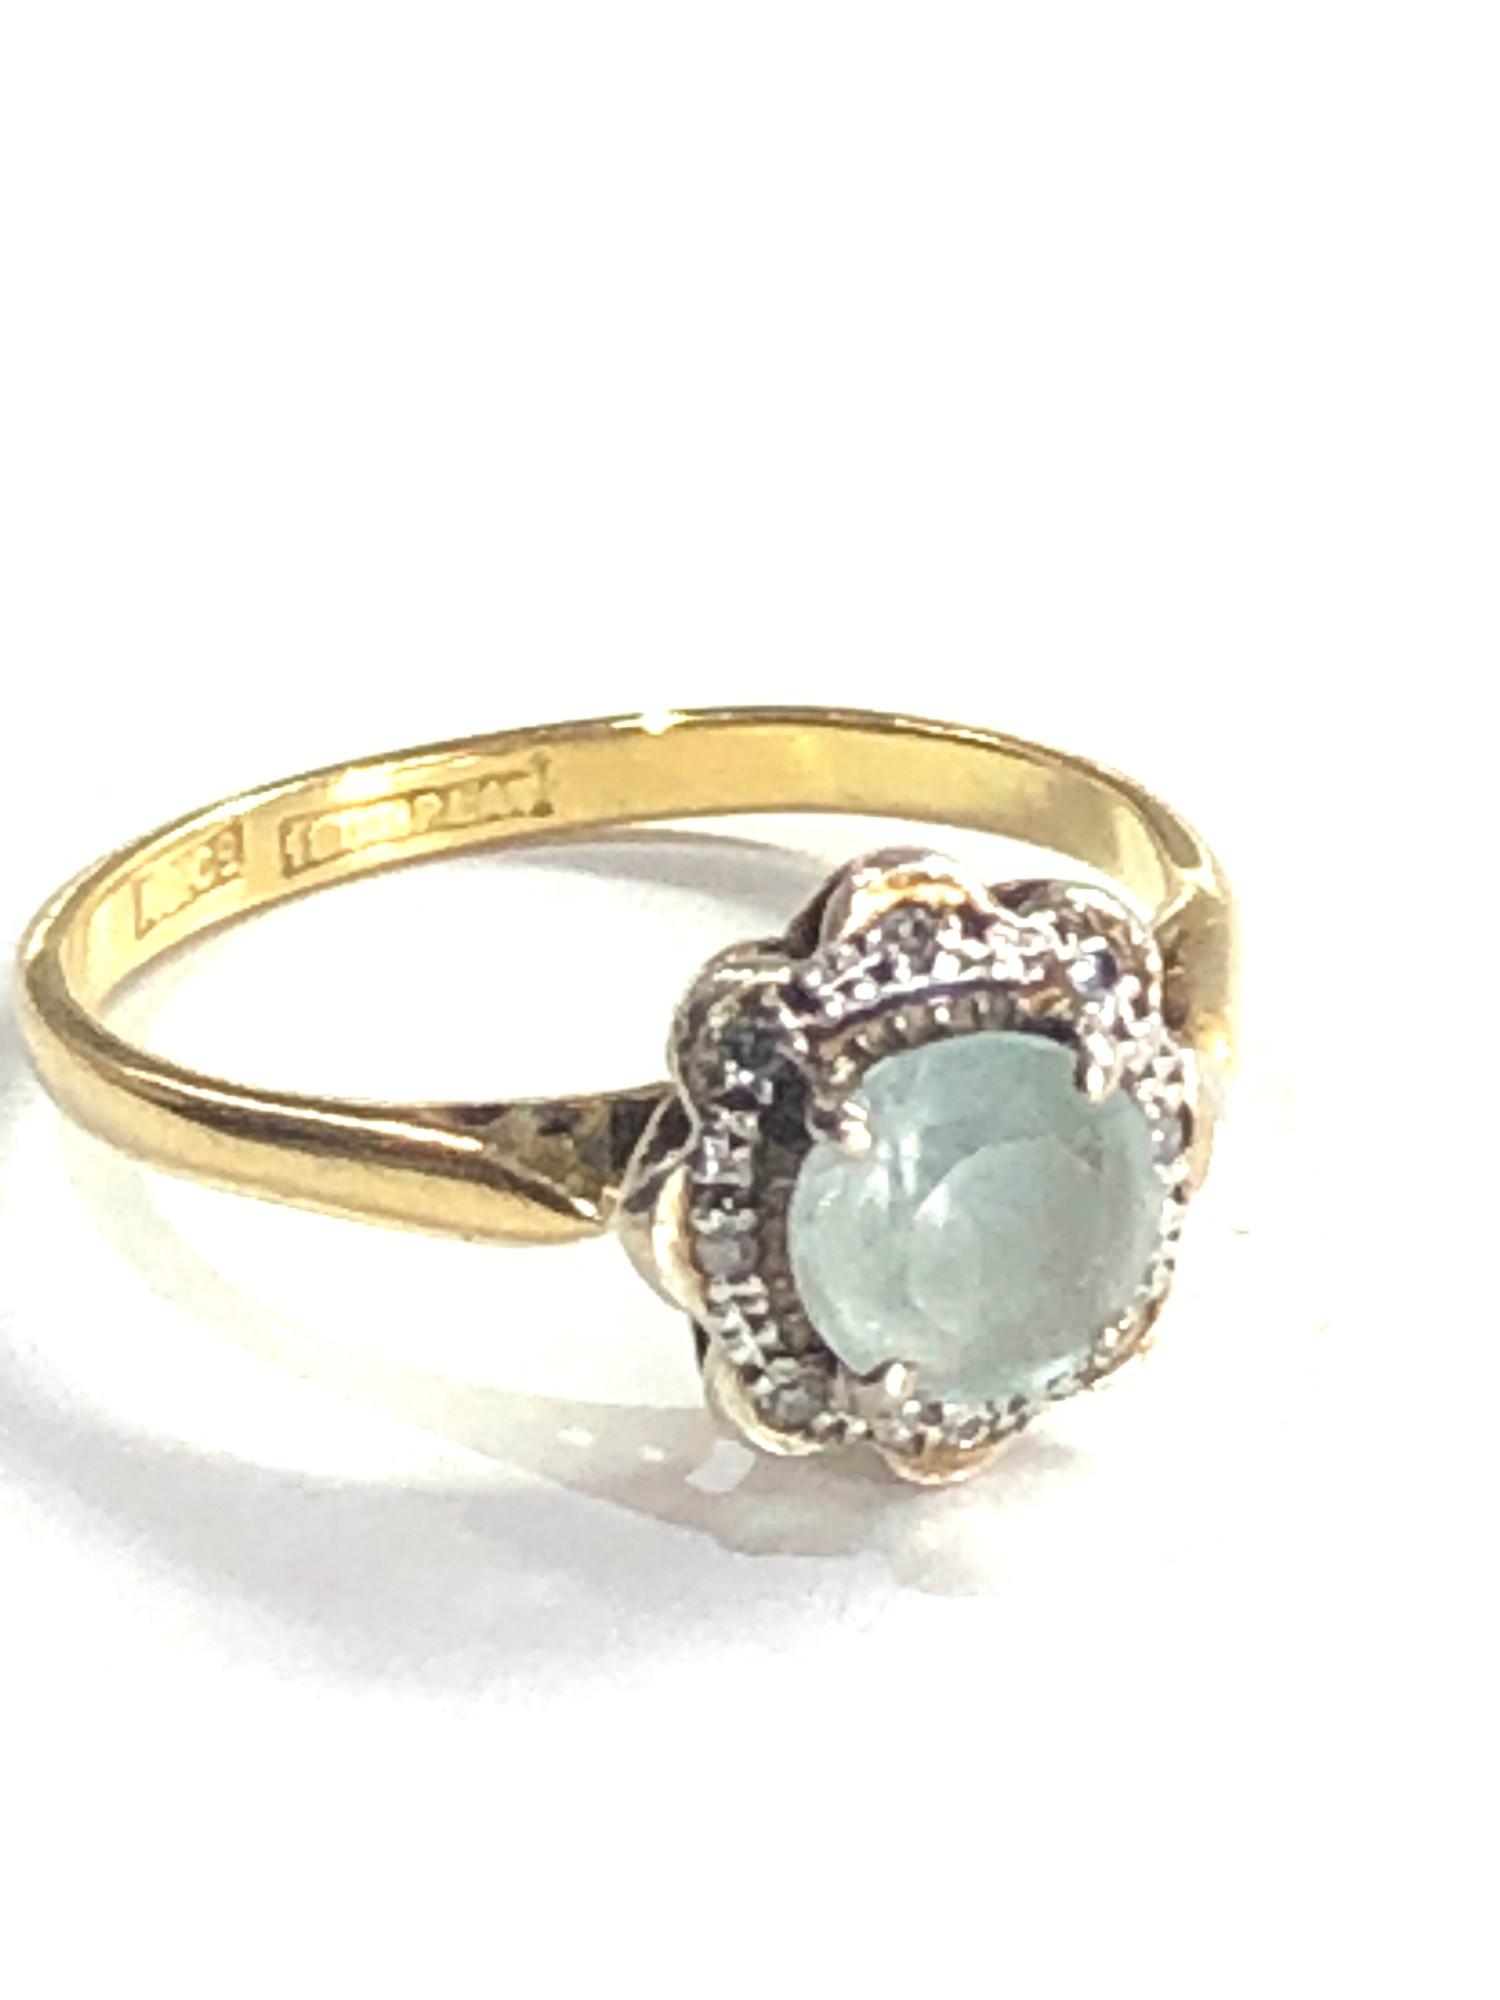 Antique 18ct gold topaz & diamond halo set ring 3.2g - Image 2 of 2